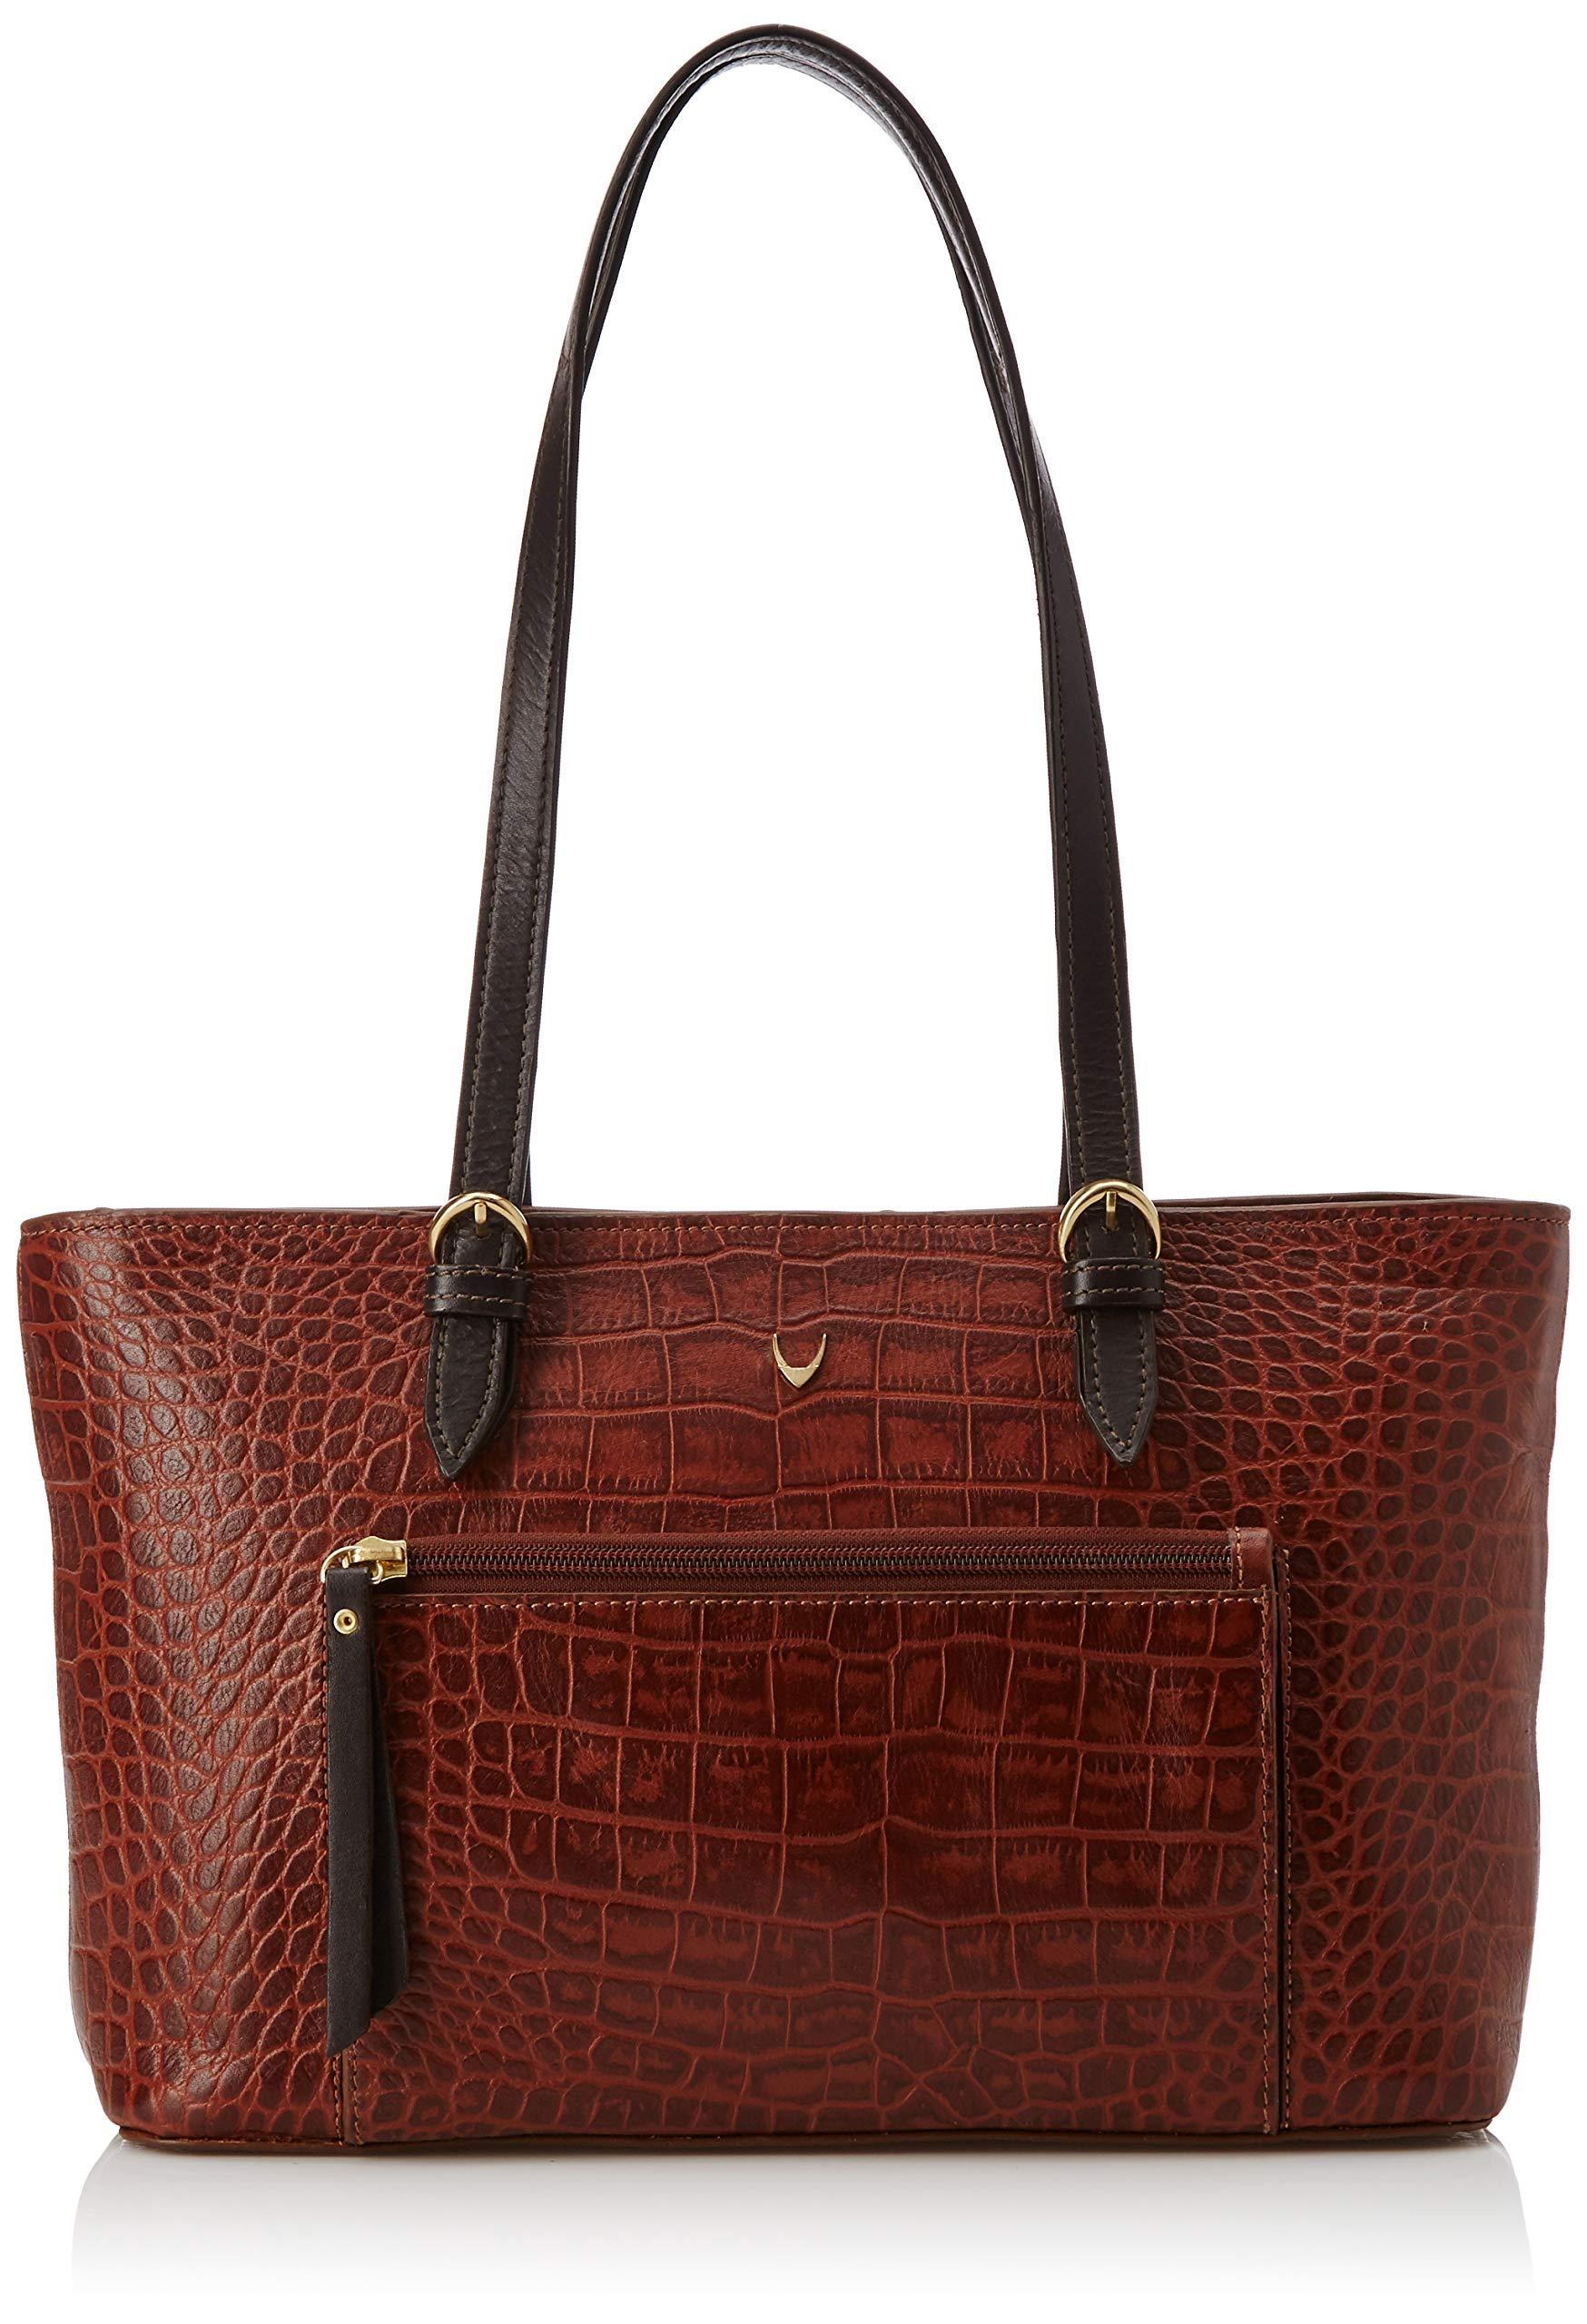 bdfd528314c6 Isle Coco by Hidesign Women's Handbag (Tan)